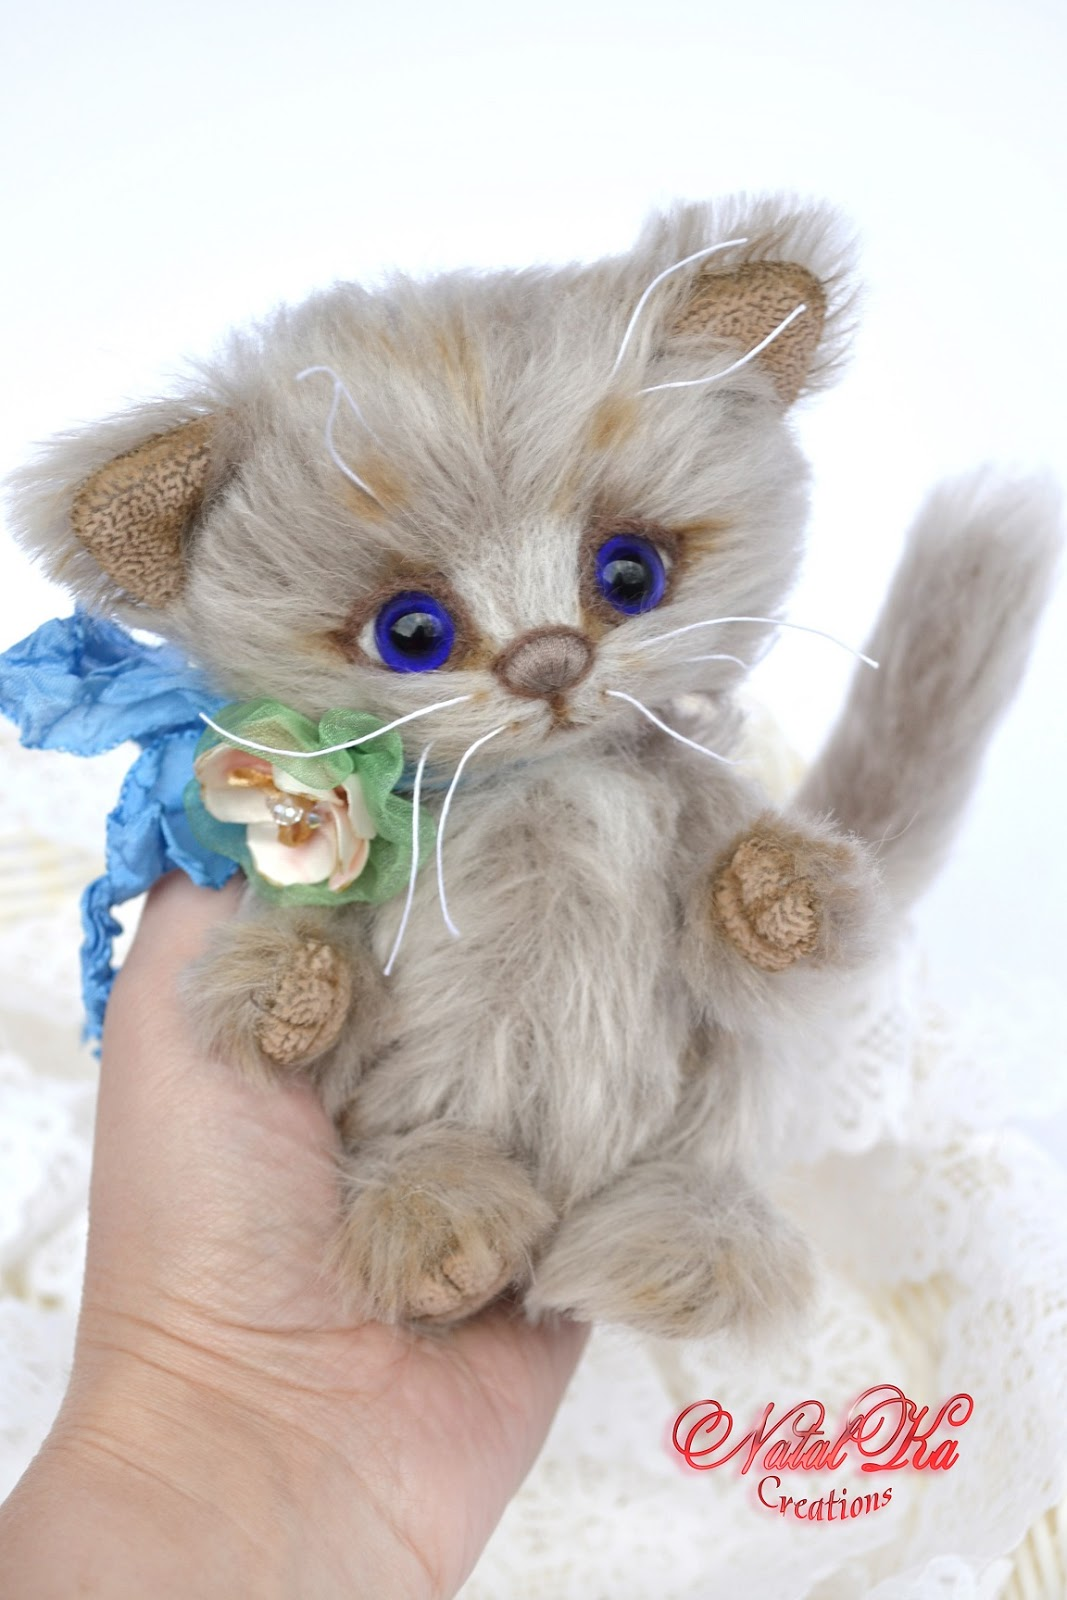 Artist teddy kitty, teddy bear, artist cat, ooak, jointed, teddies with charm, handmade by NatalKa Creations. Künstlerteddy Kätzchen, Katze, Künstlerbär, Teddybär, Unikat, Mohair, handgemacht von NatalKa Creations.